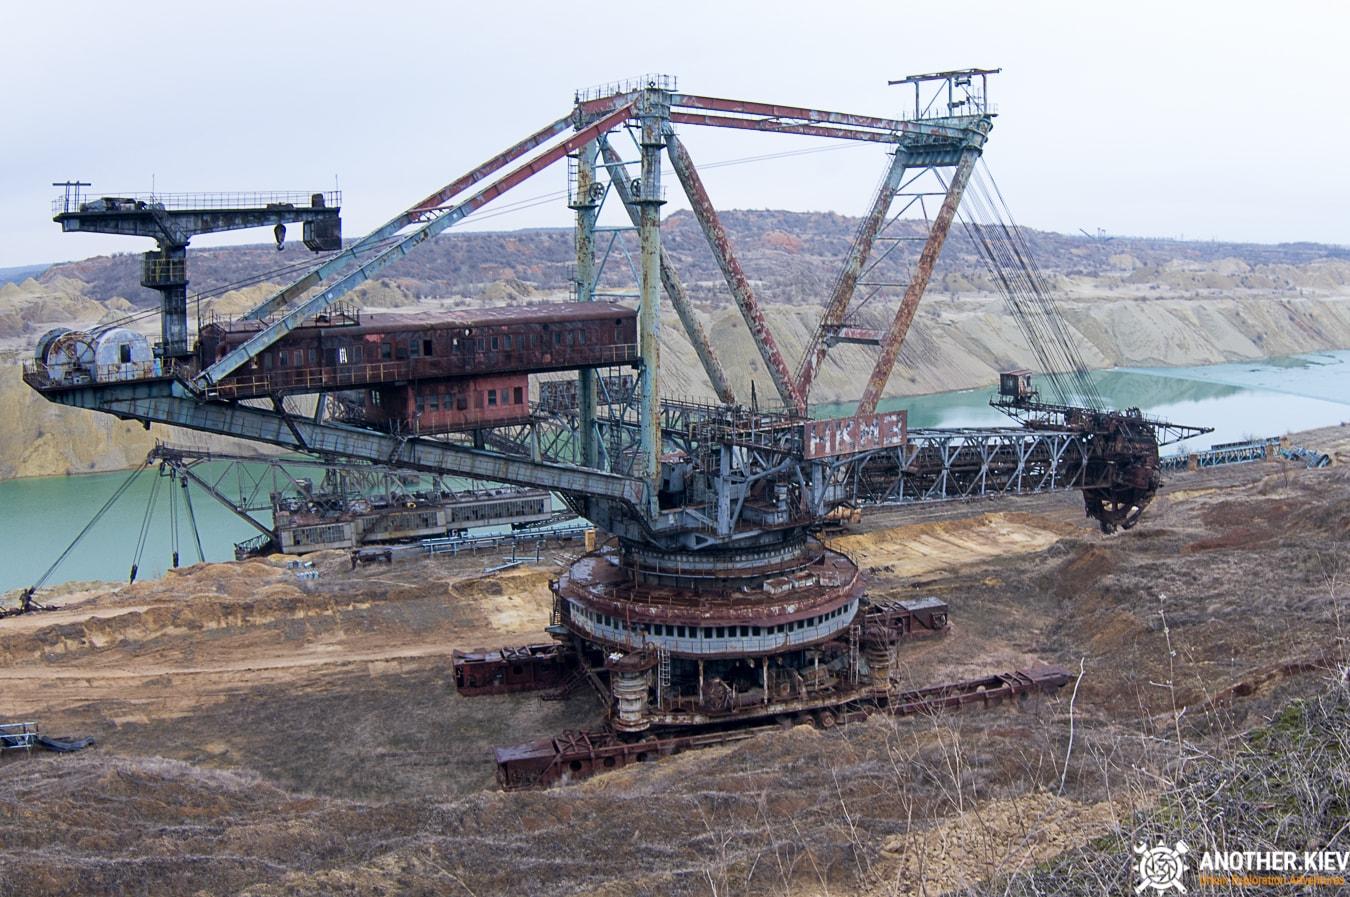 abandoned excavator in the Morozovo coal mine